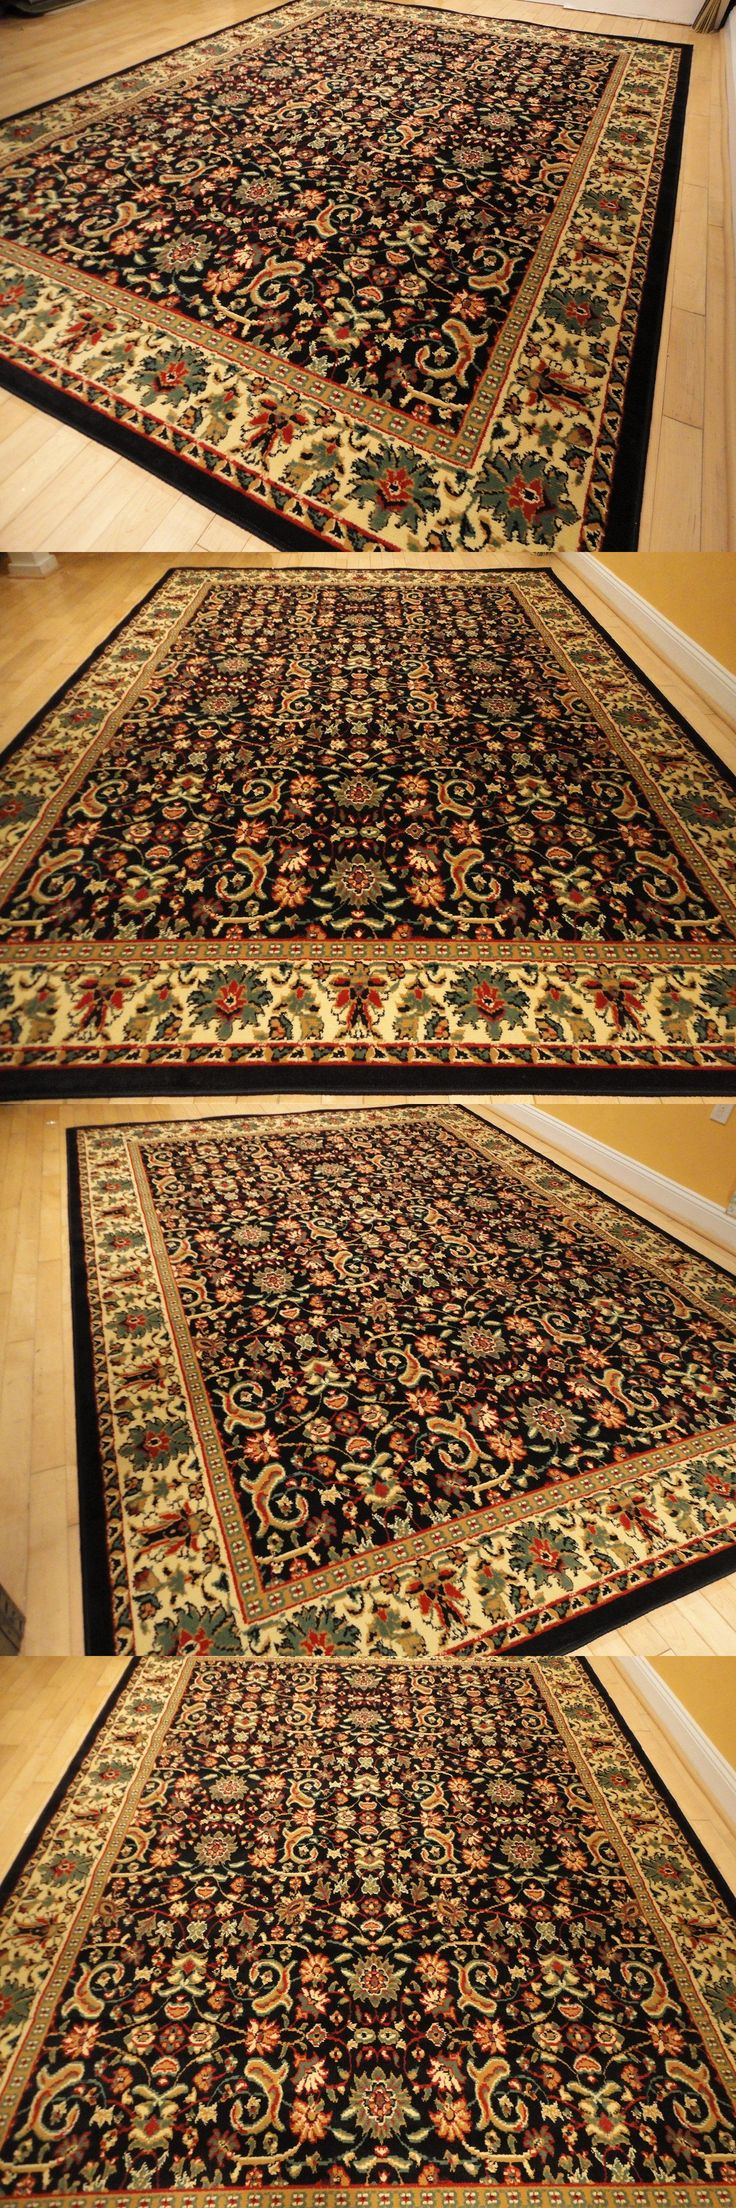 best 25 area rugs on sale ideas on pinterest area rugs cheap